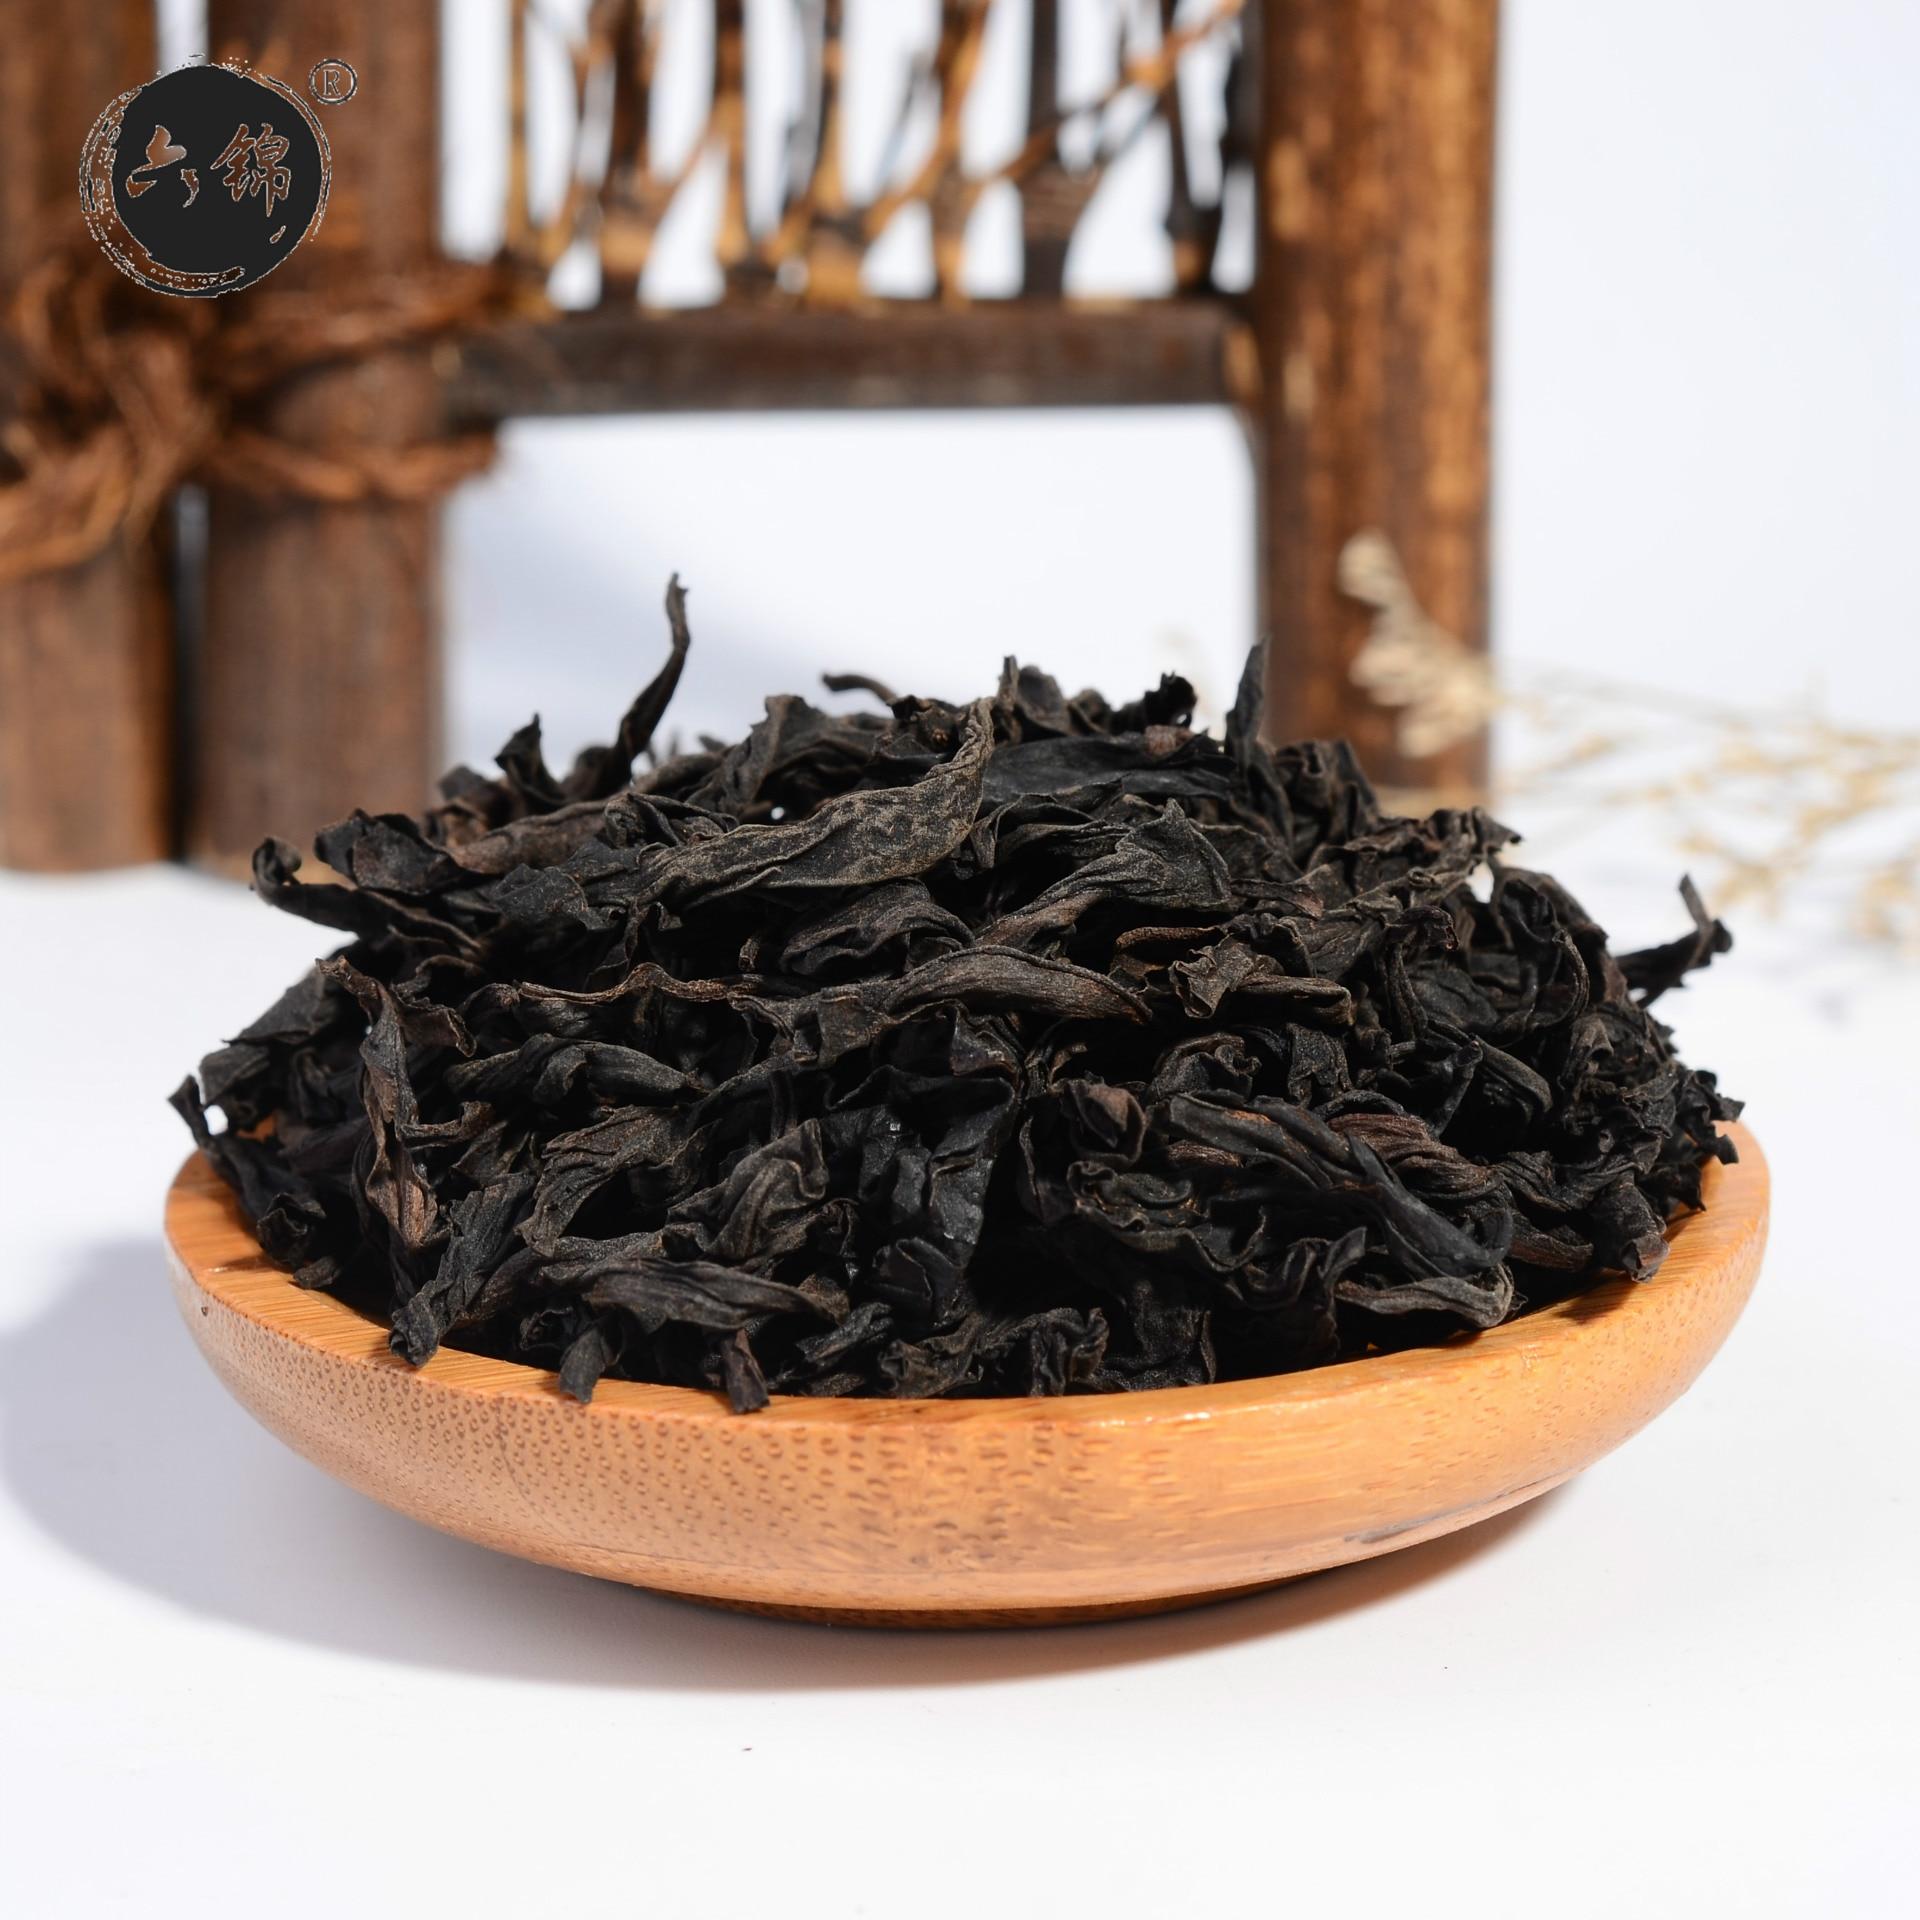 Wuyi Dahongpao Black Tea Slimming Body Health Care 250g 470g hongkong royal burdock with black tea 25 pouches herbal tea slimming tea health tea free shipping